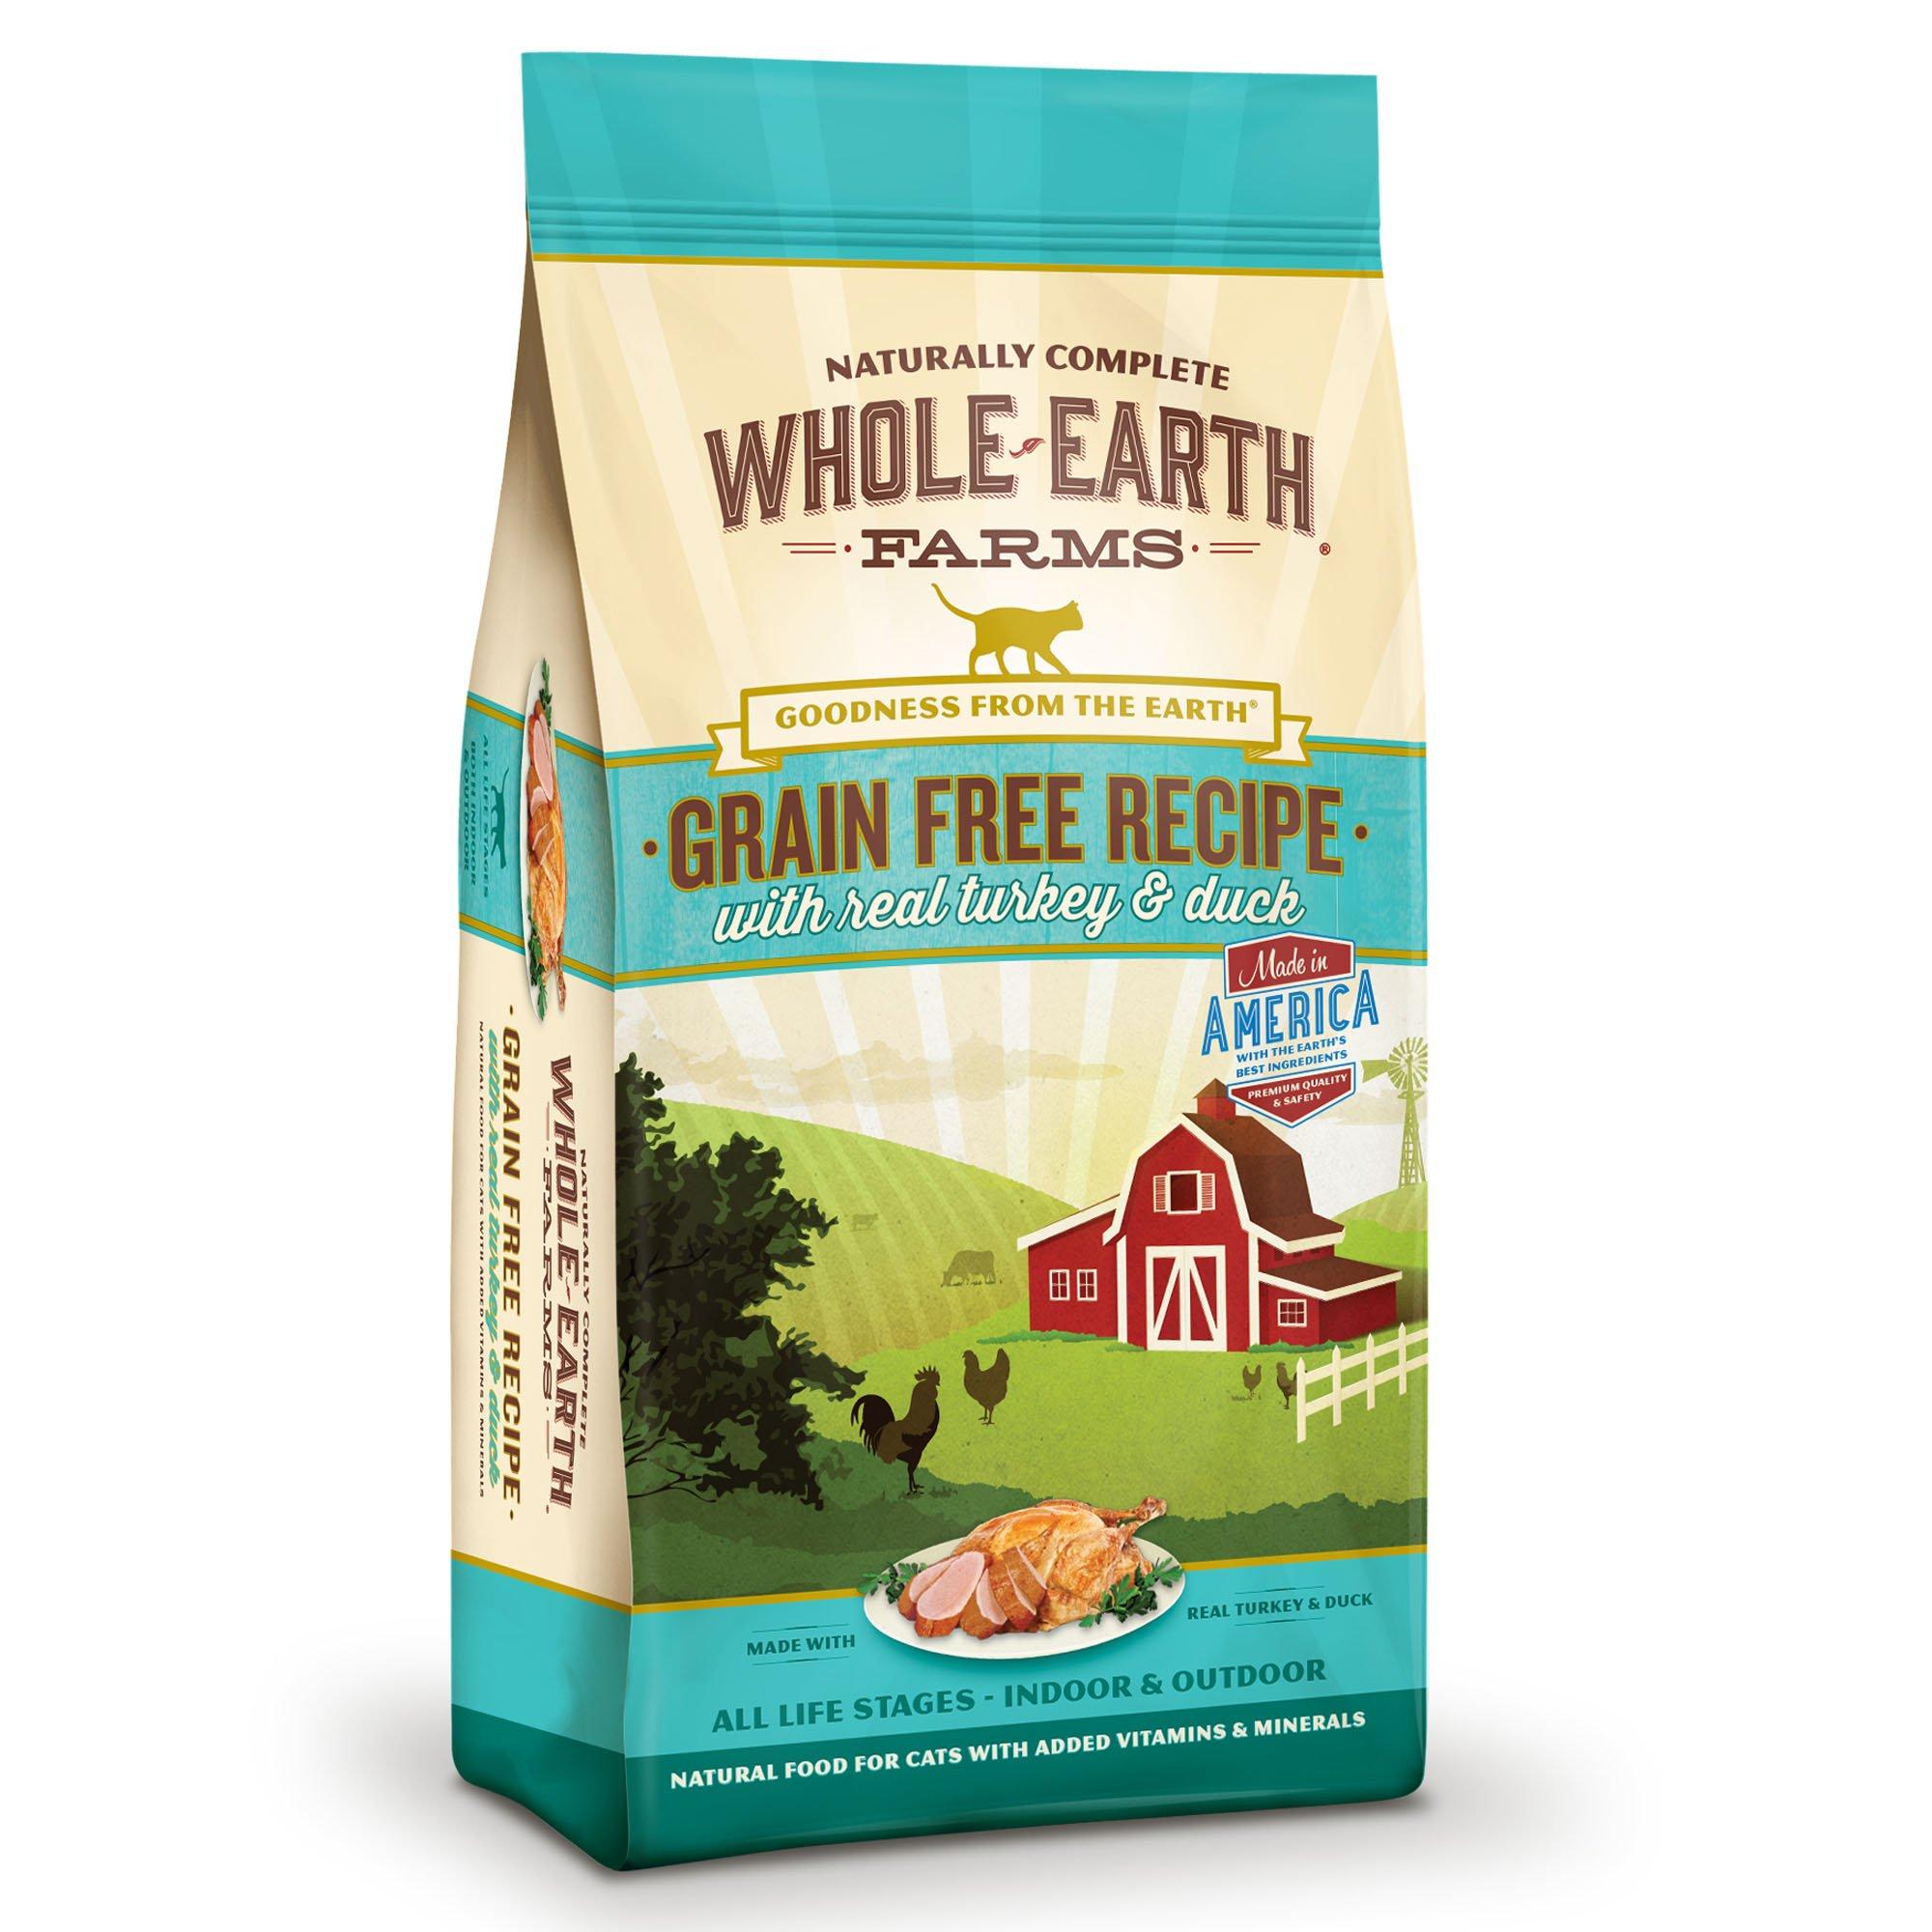 Whole-Earth-Farms-Grain-Free-Real-Turkey-amp-Duck-Cat-Food thumbnail 20